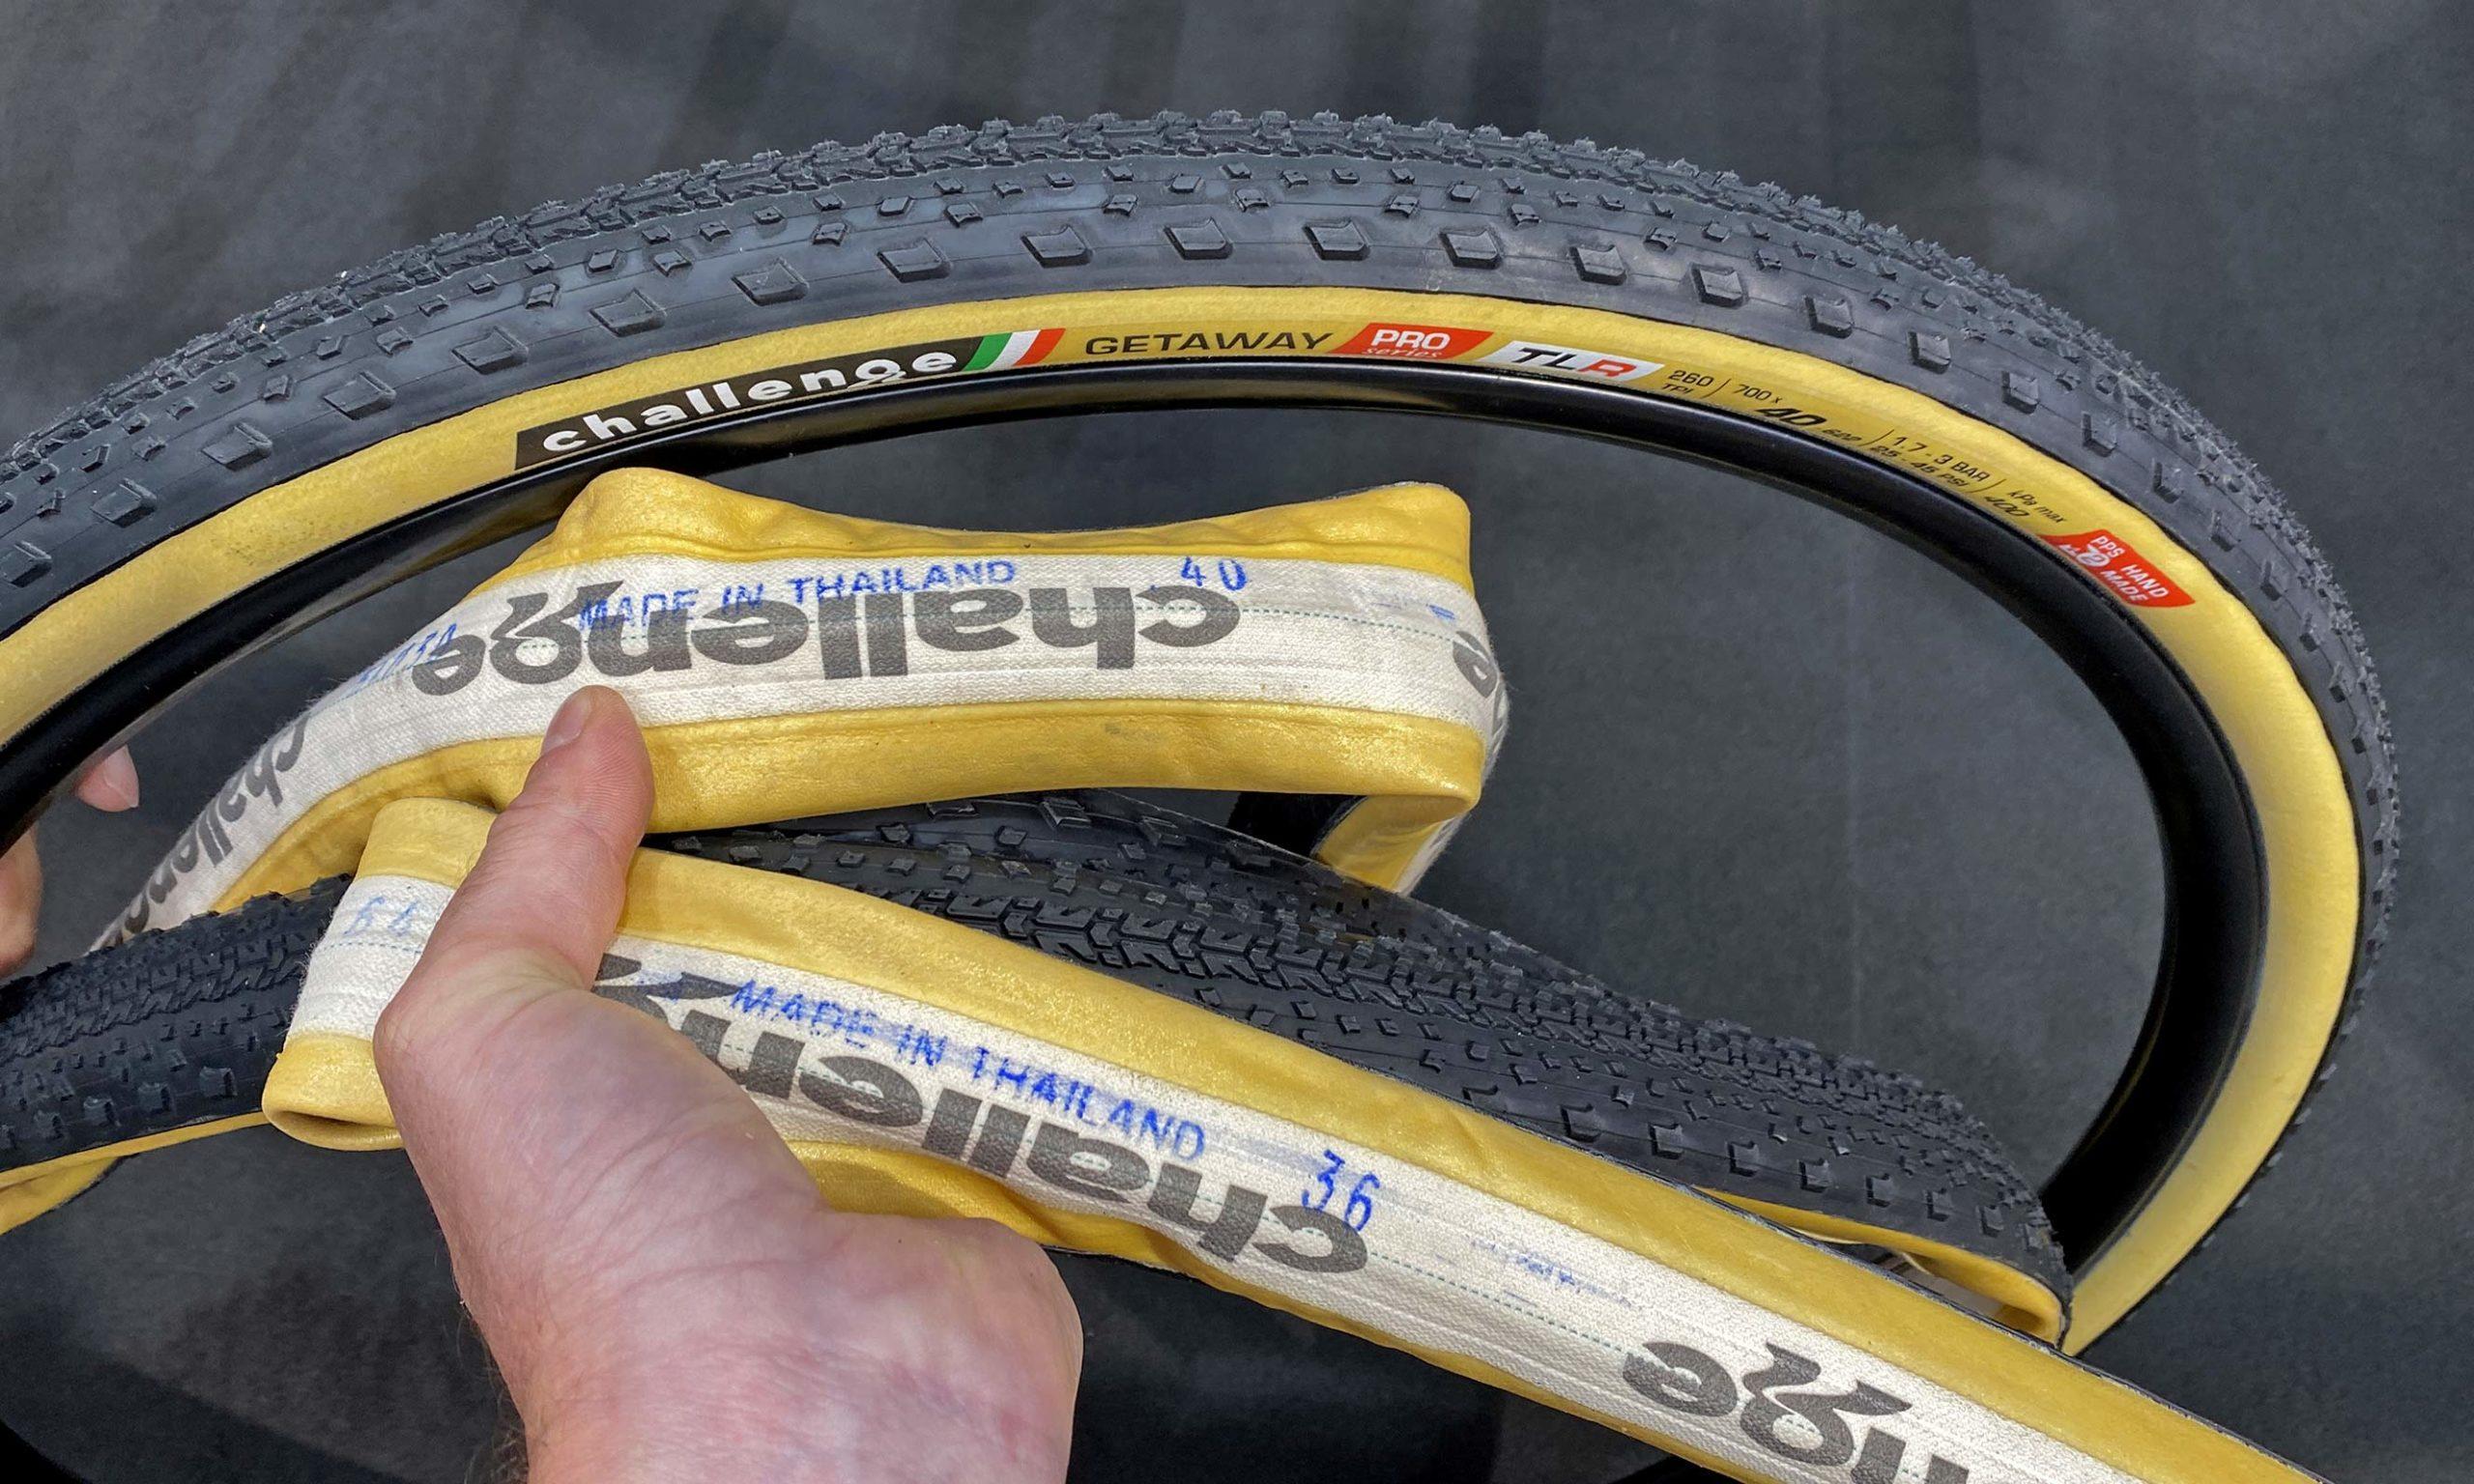 Challenge Getaway gravel bike tires, handmade tubeless tubular H-TLTU, 36mm & 40mm